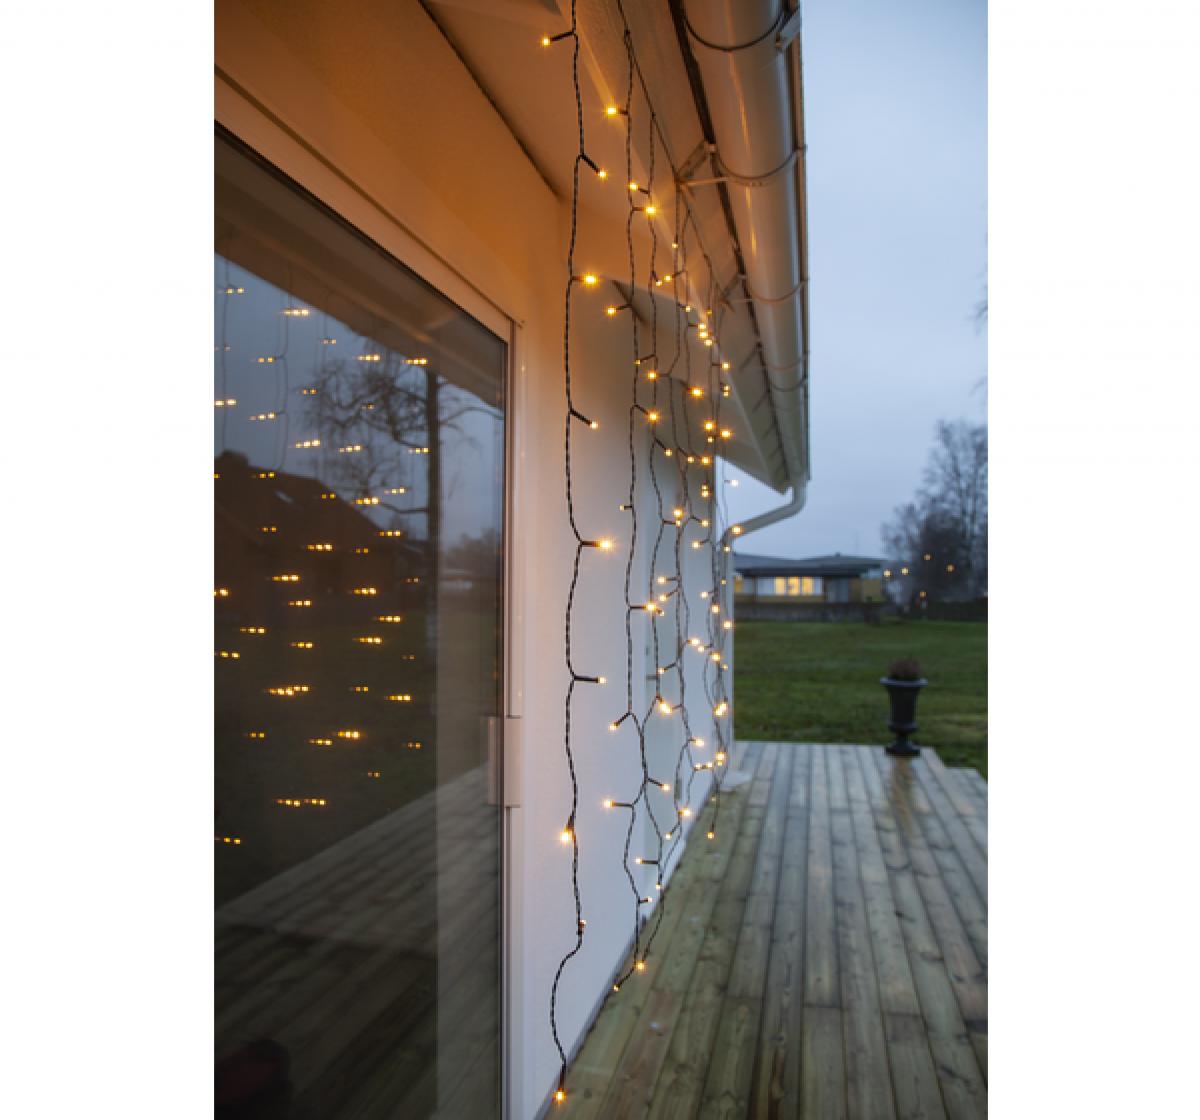 Гирлянда уличная LED STAR TRADING 594-24 - Фото №32